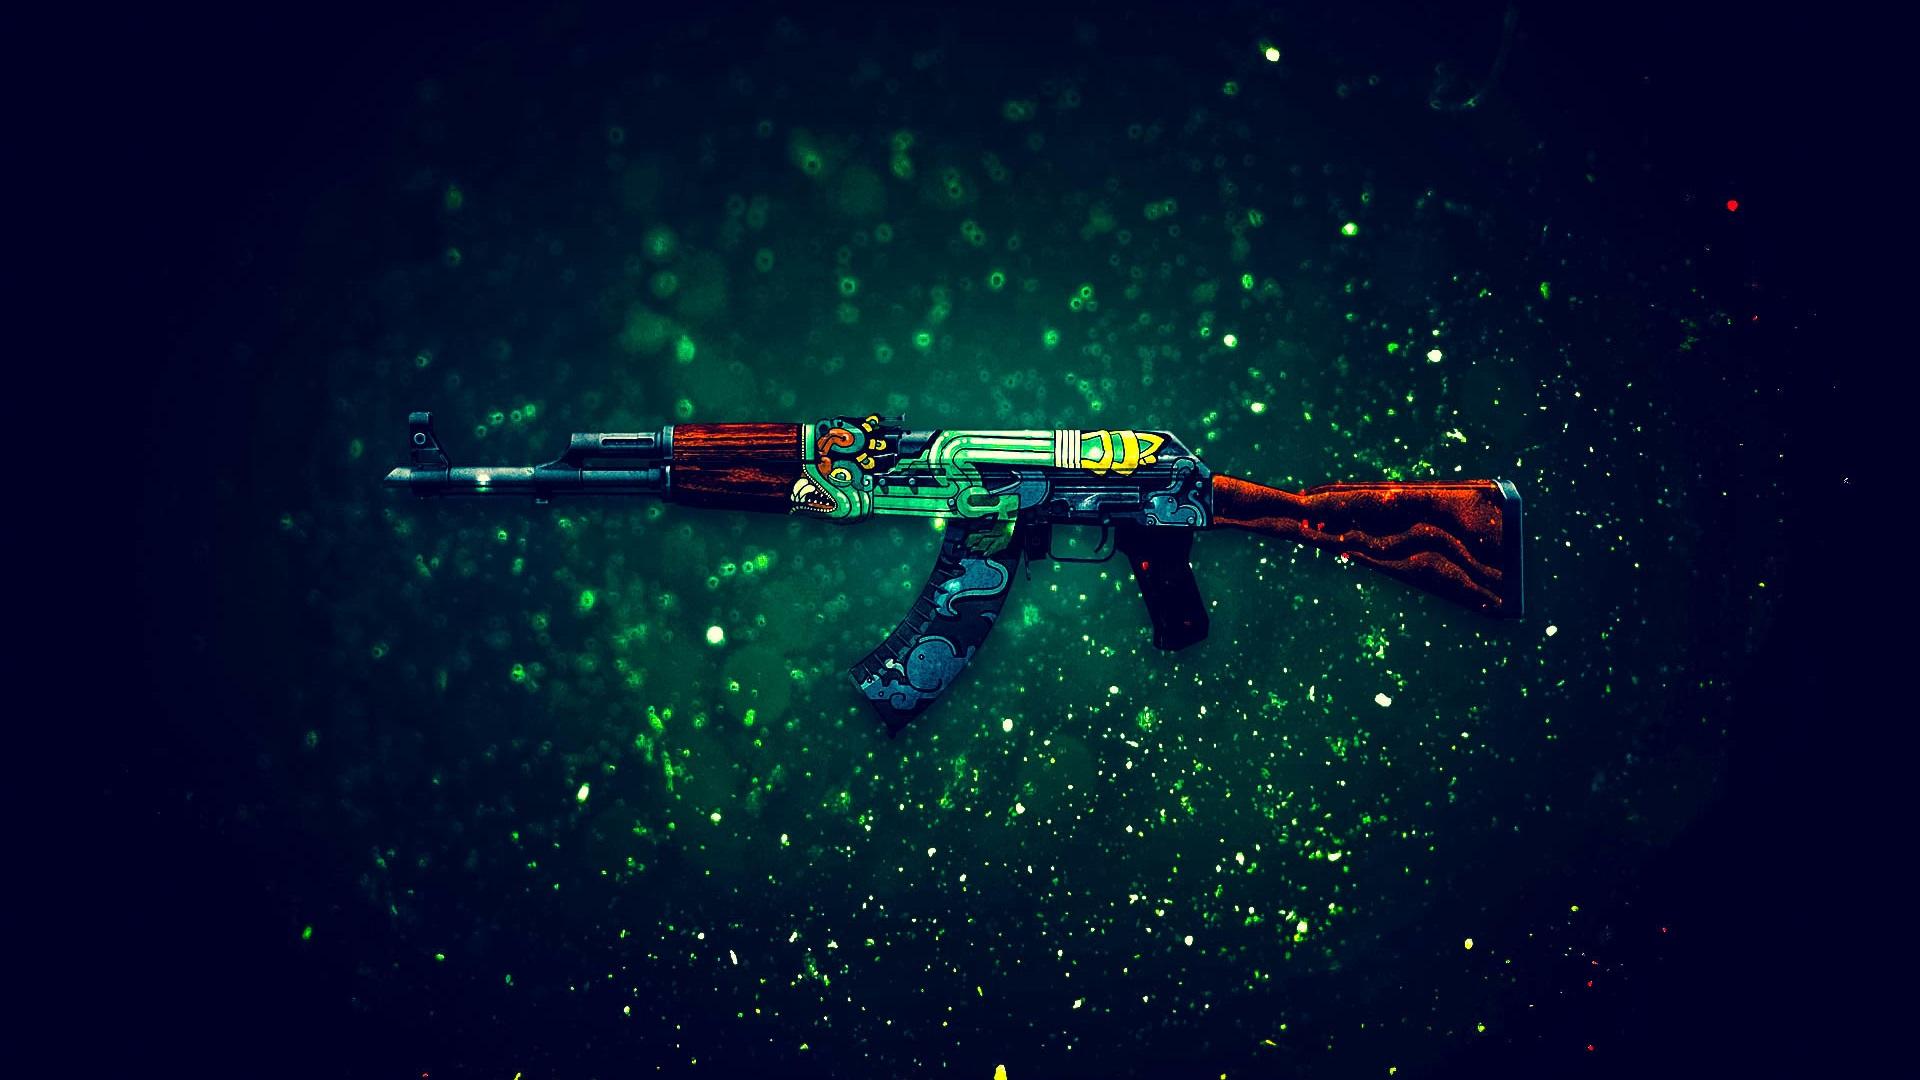 Fonds D'écran CS GO Jeu, AK-47 Fusil D'assaut 1920x1200 HD